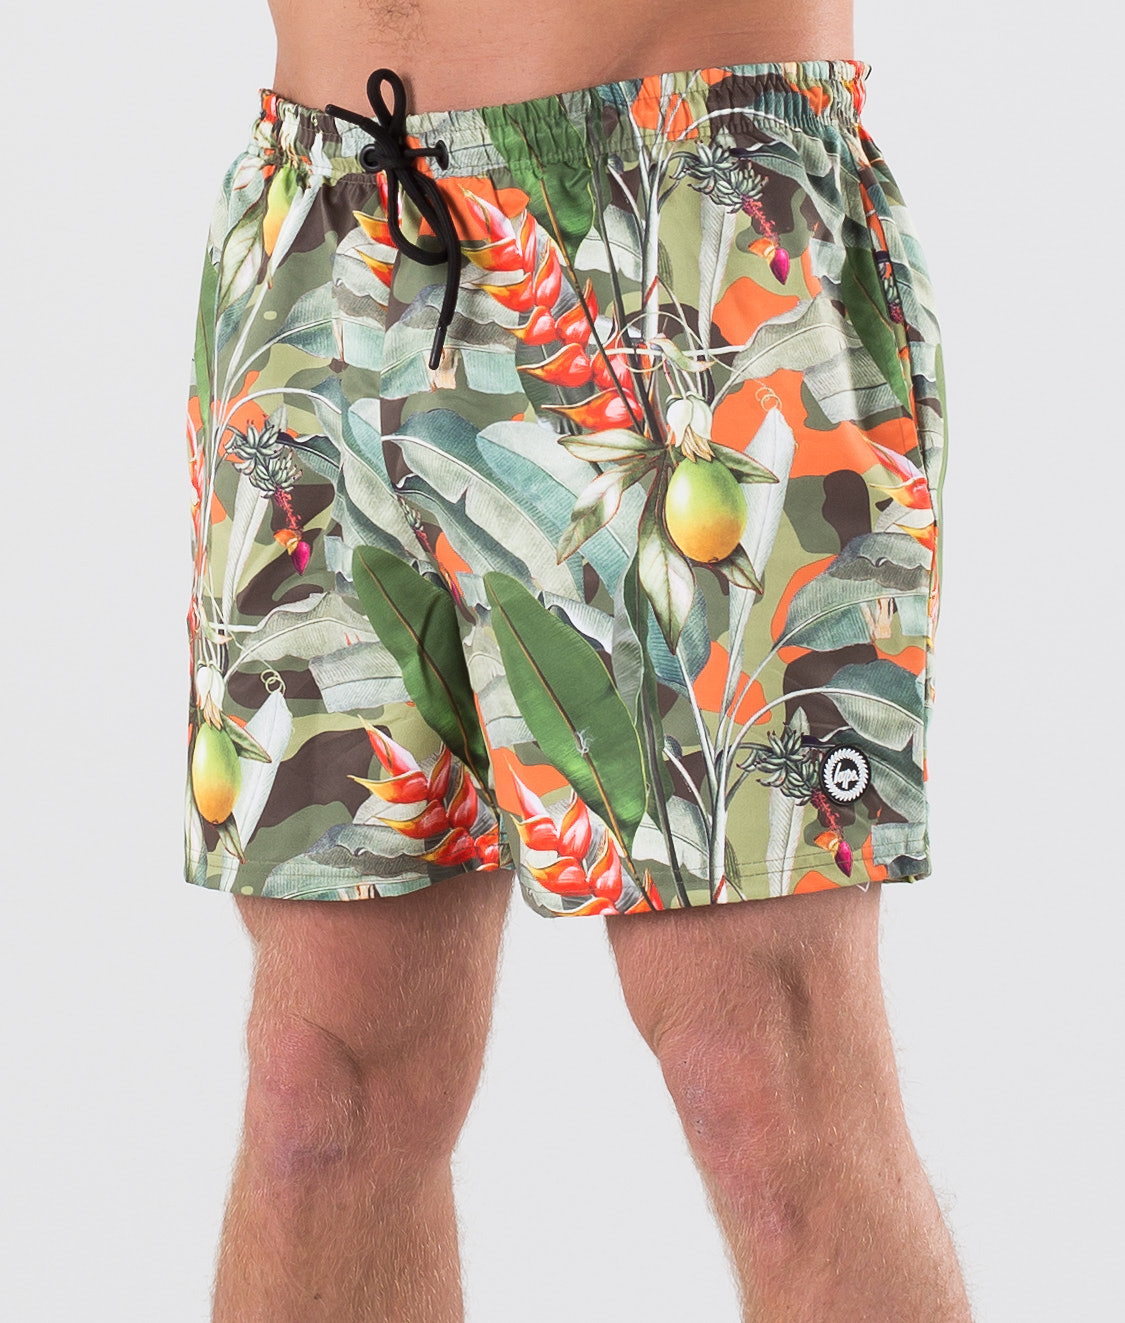 bdcc6789d4eb9 Men's Boardshorts | Swimwear | RIDESTORE